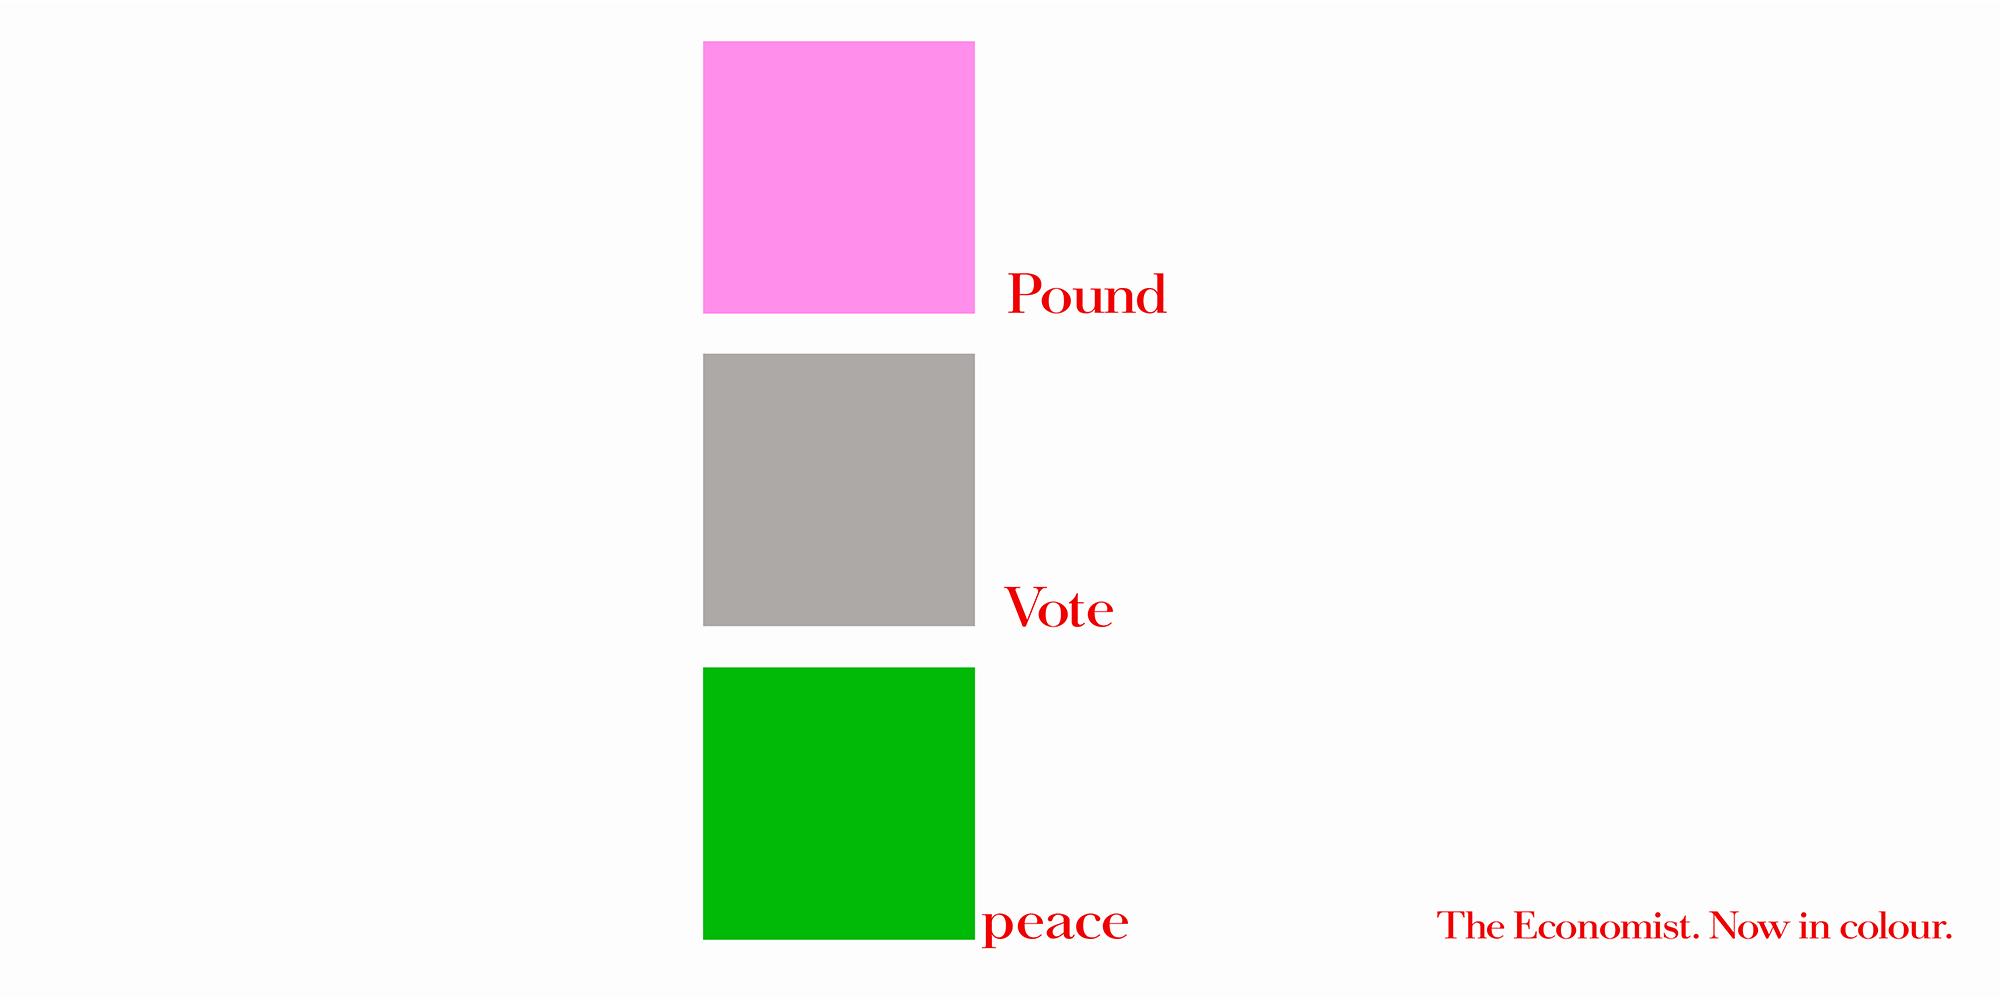 'Pink Pound' The Economist_Colour, Dave Dye, AMV_BBDO.